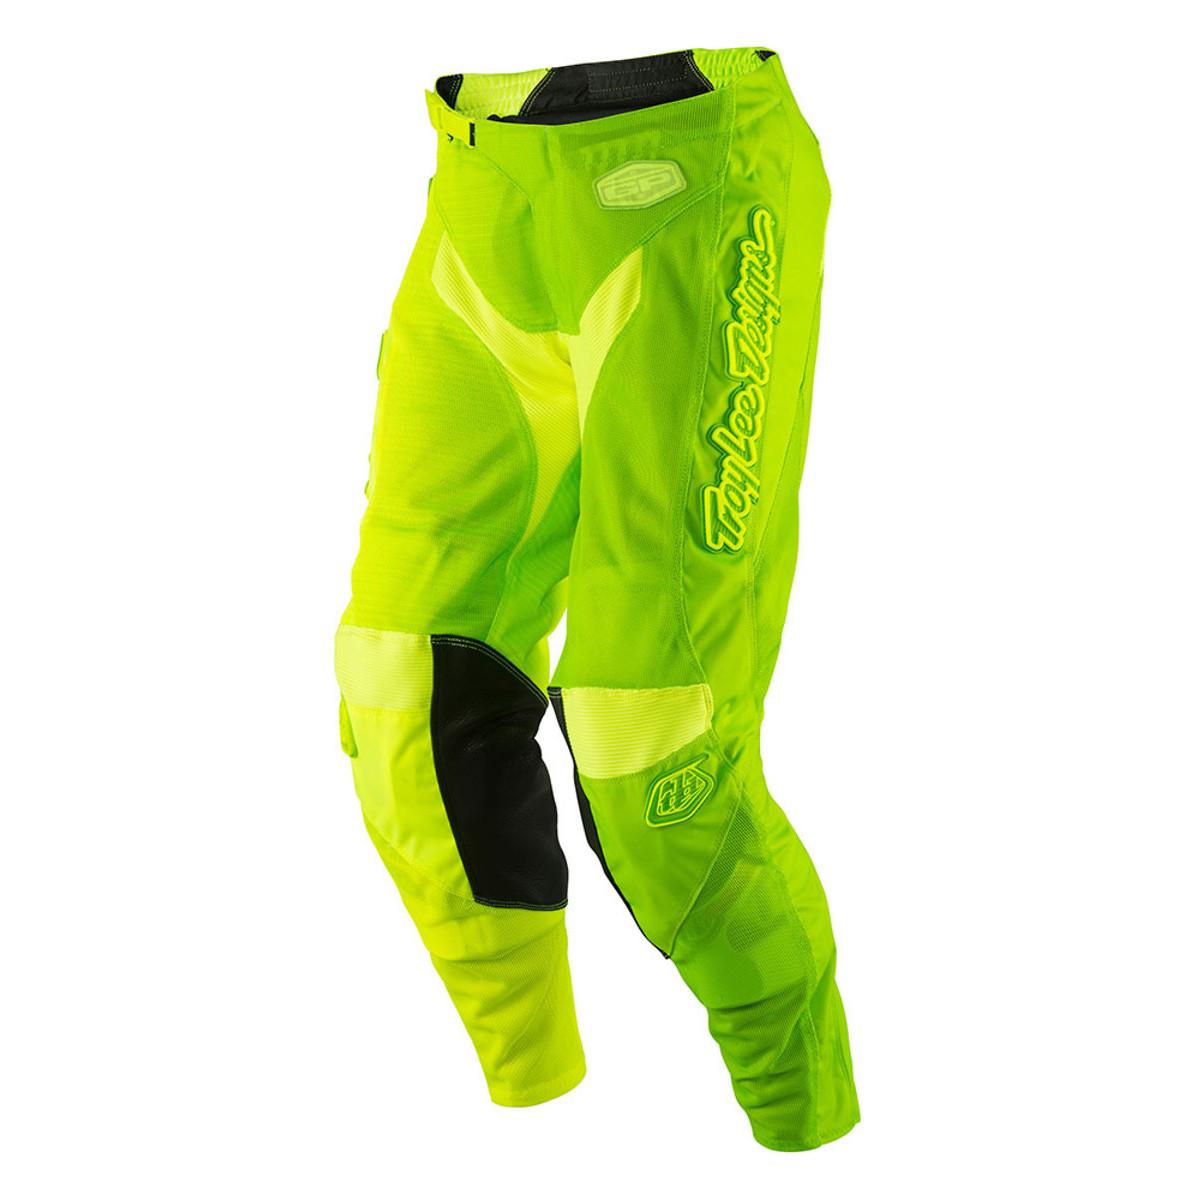 Troy Lee Designs GP Air 50/50 Pants Troy Lee Designs GP Air 50/50 Green and Yellow